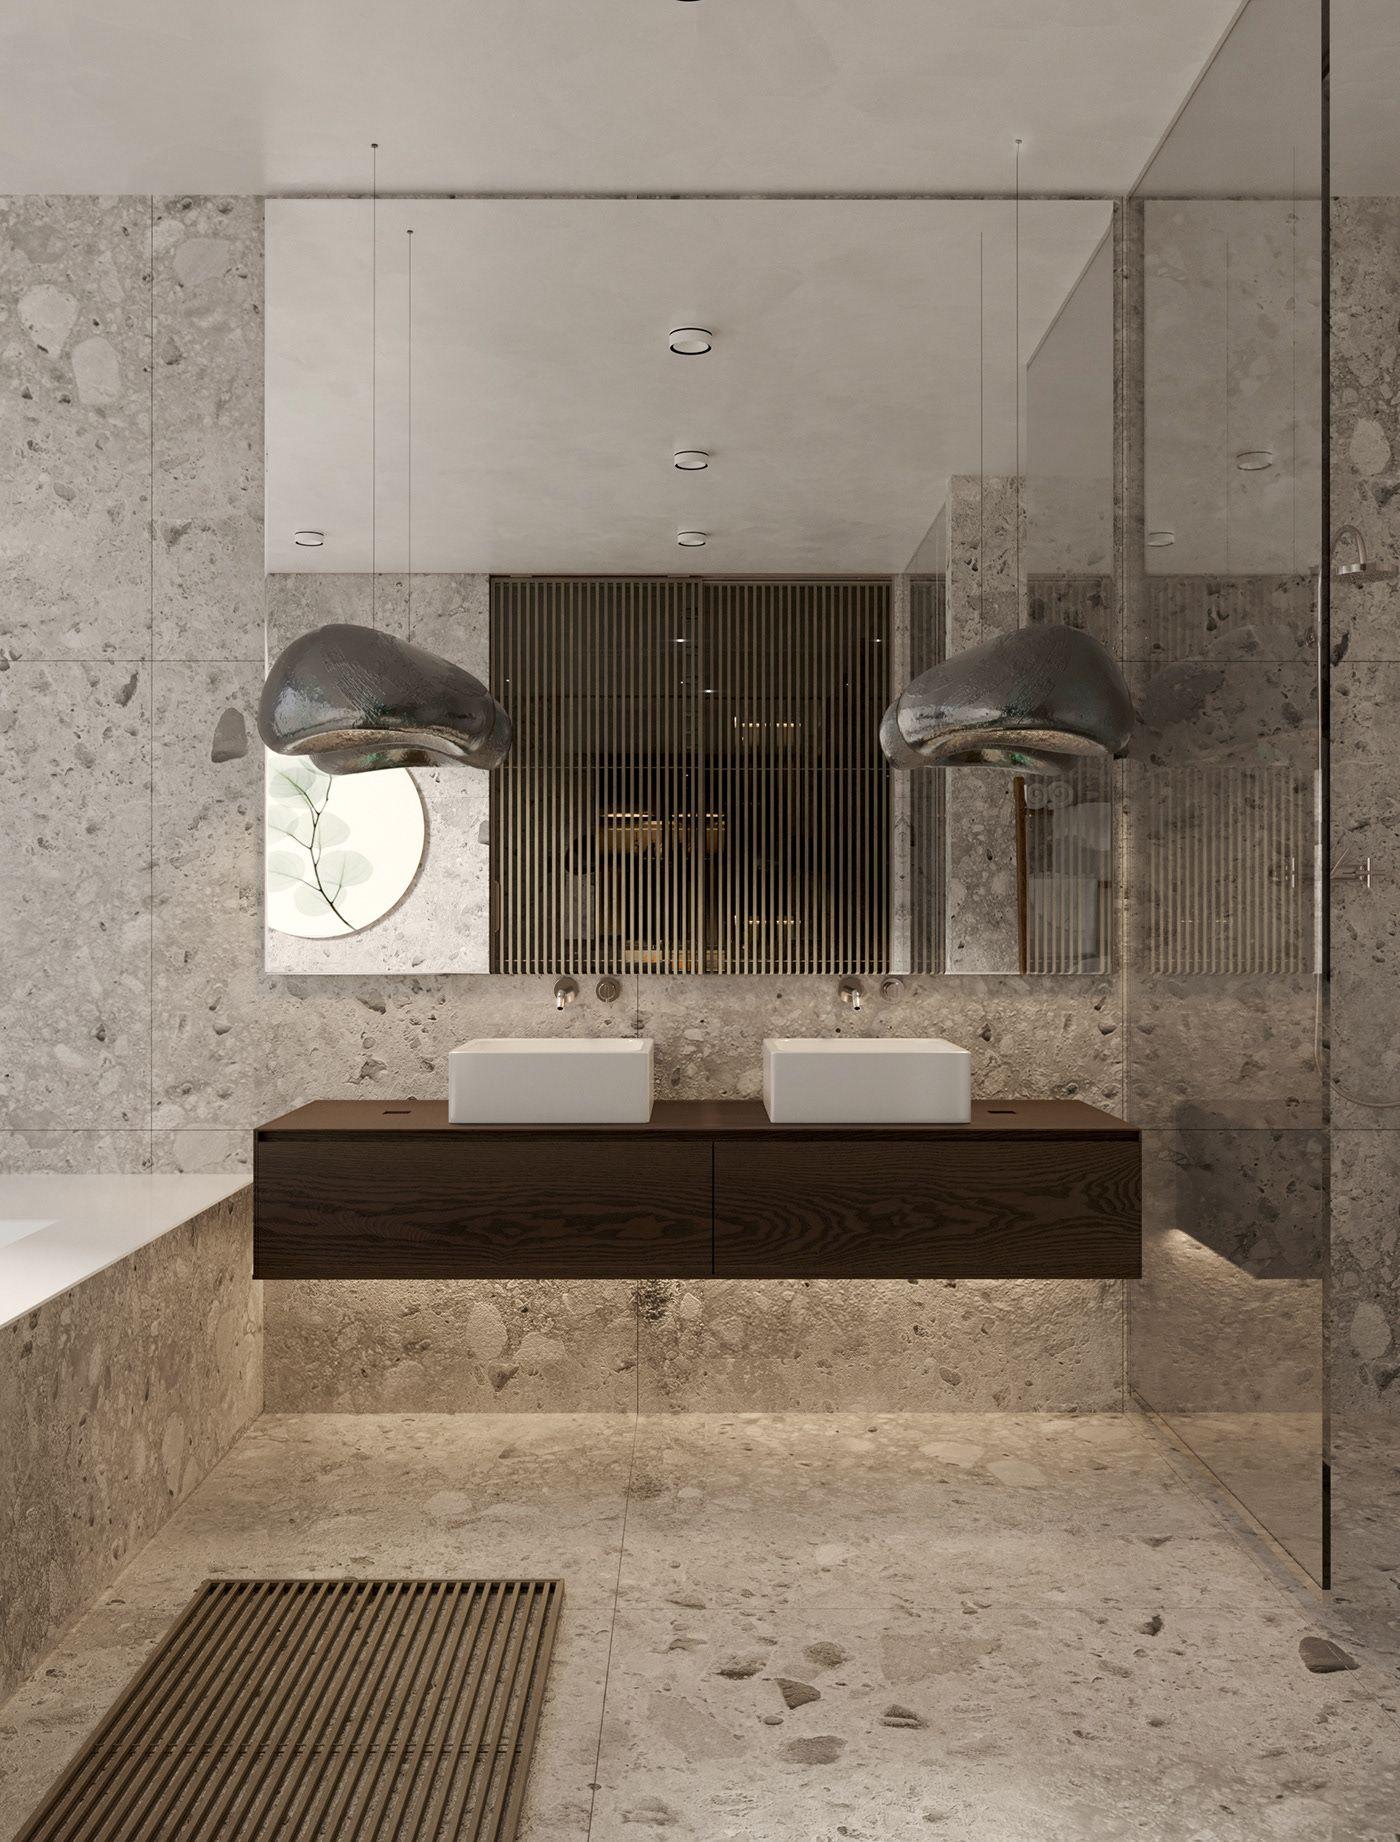 Pin By Lala Bayern On Wc Bathroom Inspiration Bathroom Decor Bathroom Spa